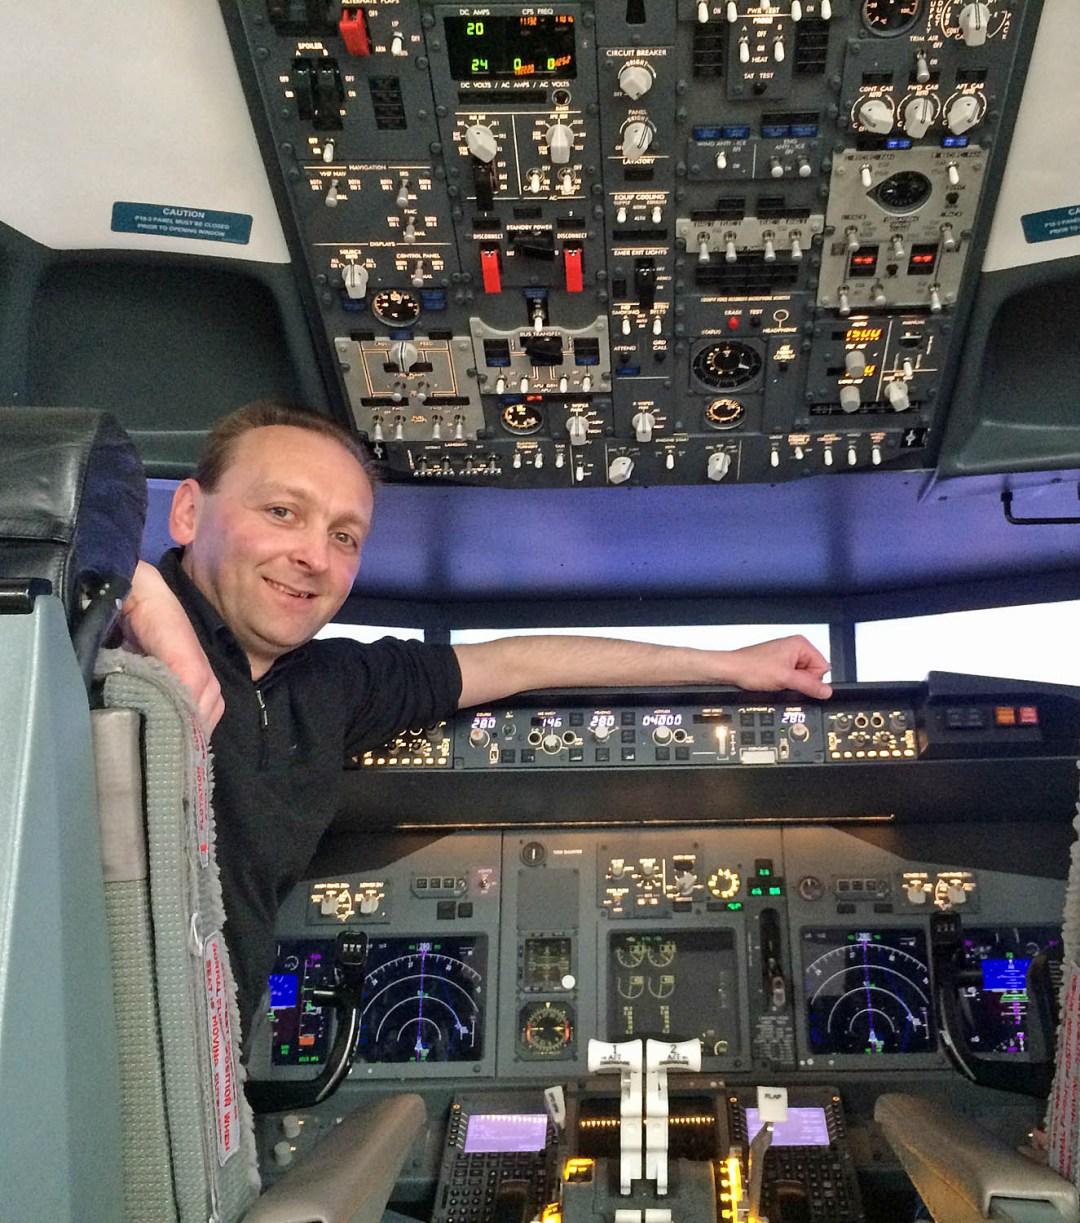 Shane McDonald at the controls of a Boeing 737 flight simulator